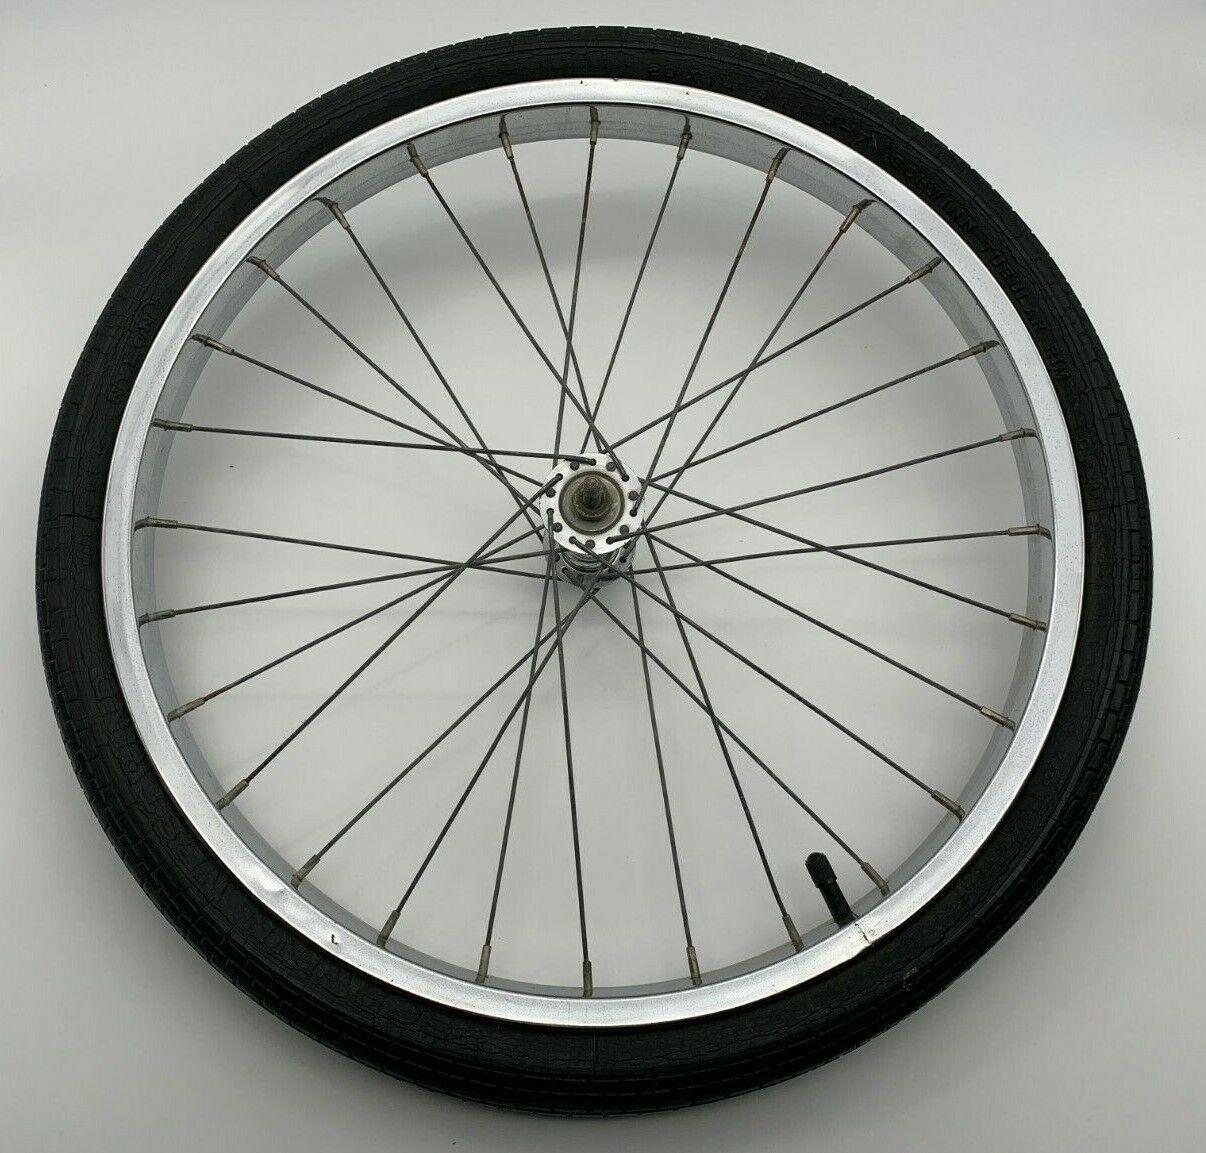 BICYCLE TIRES FOR SCHWINN STINGRAY 20 x 1 3//4 S-7 WHEEL RIMS